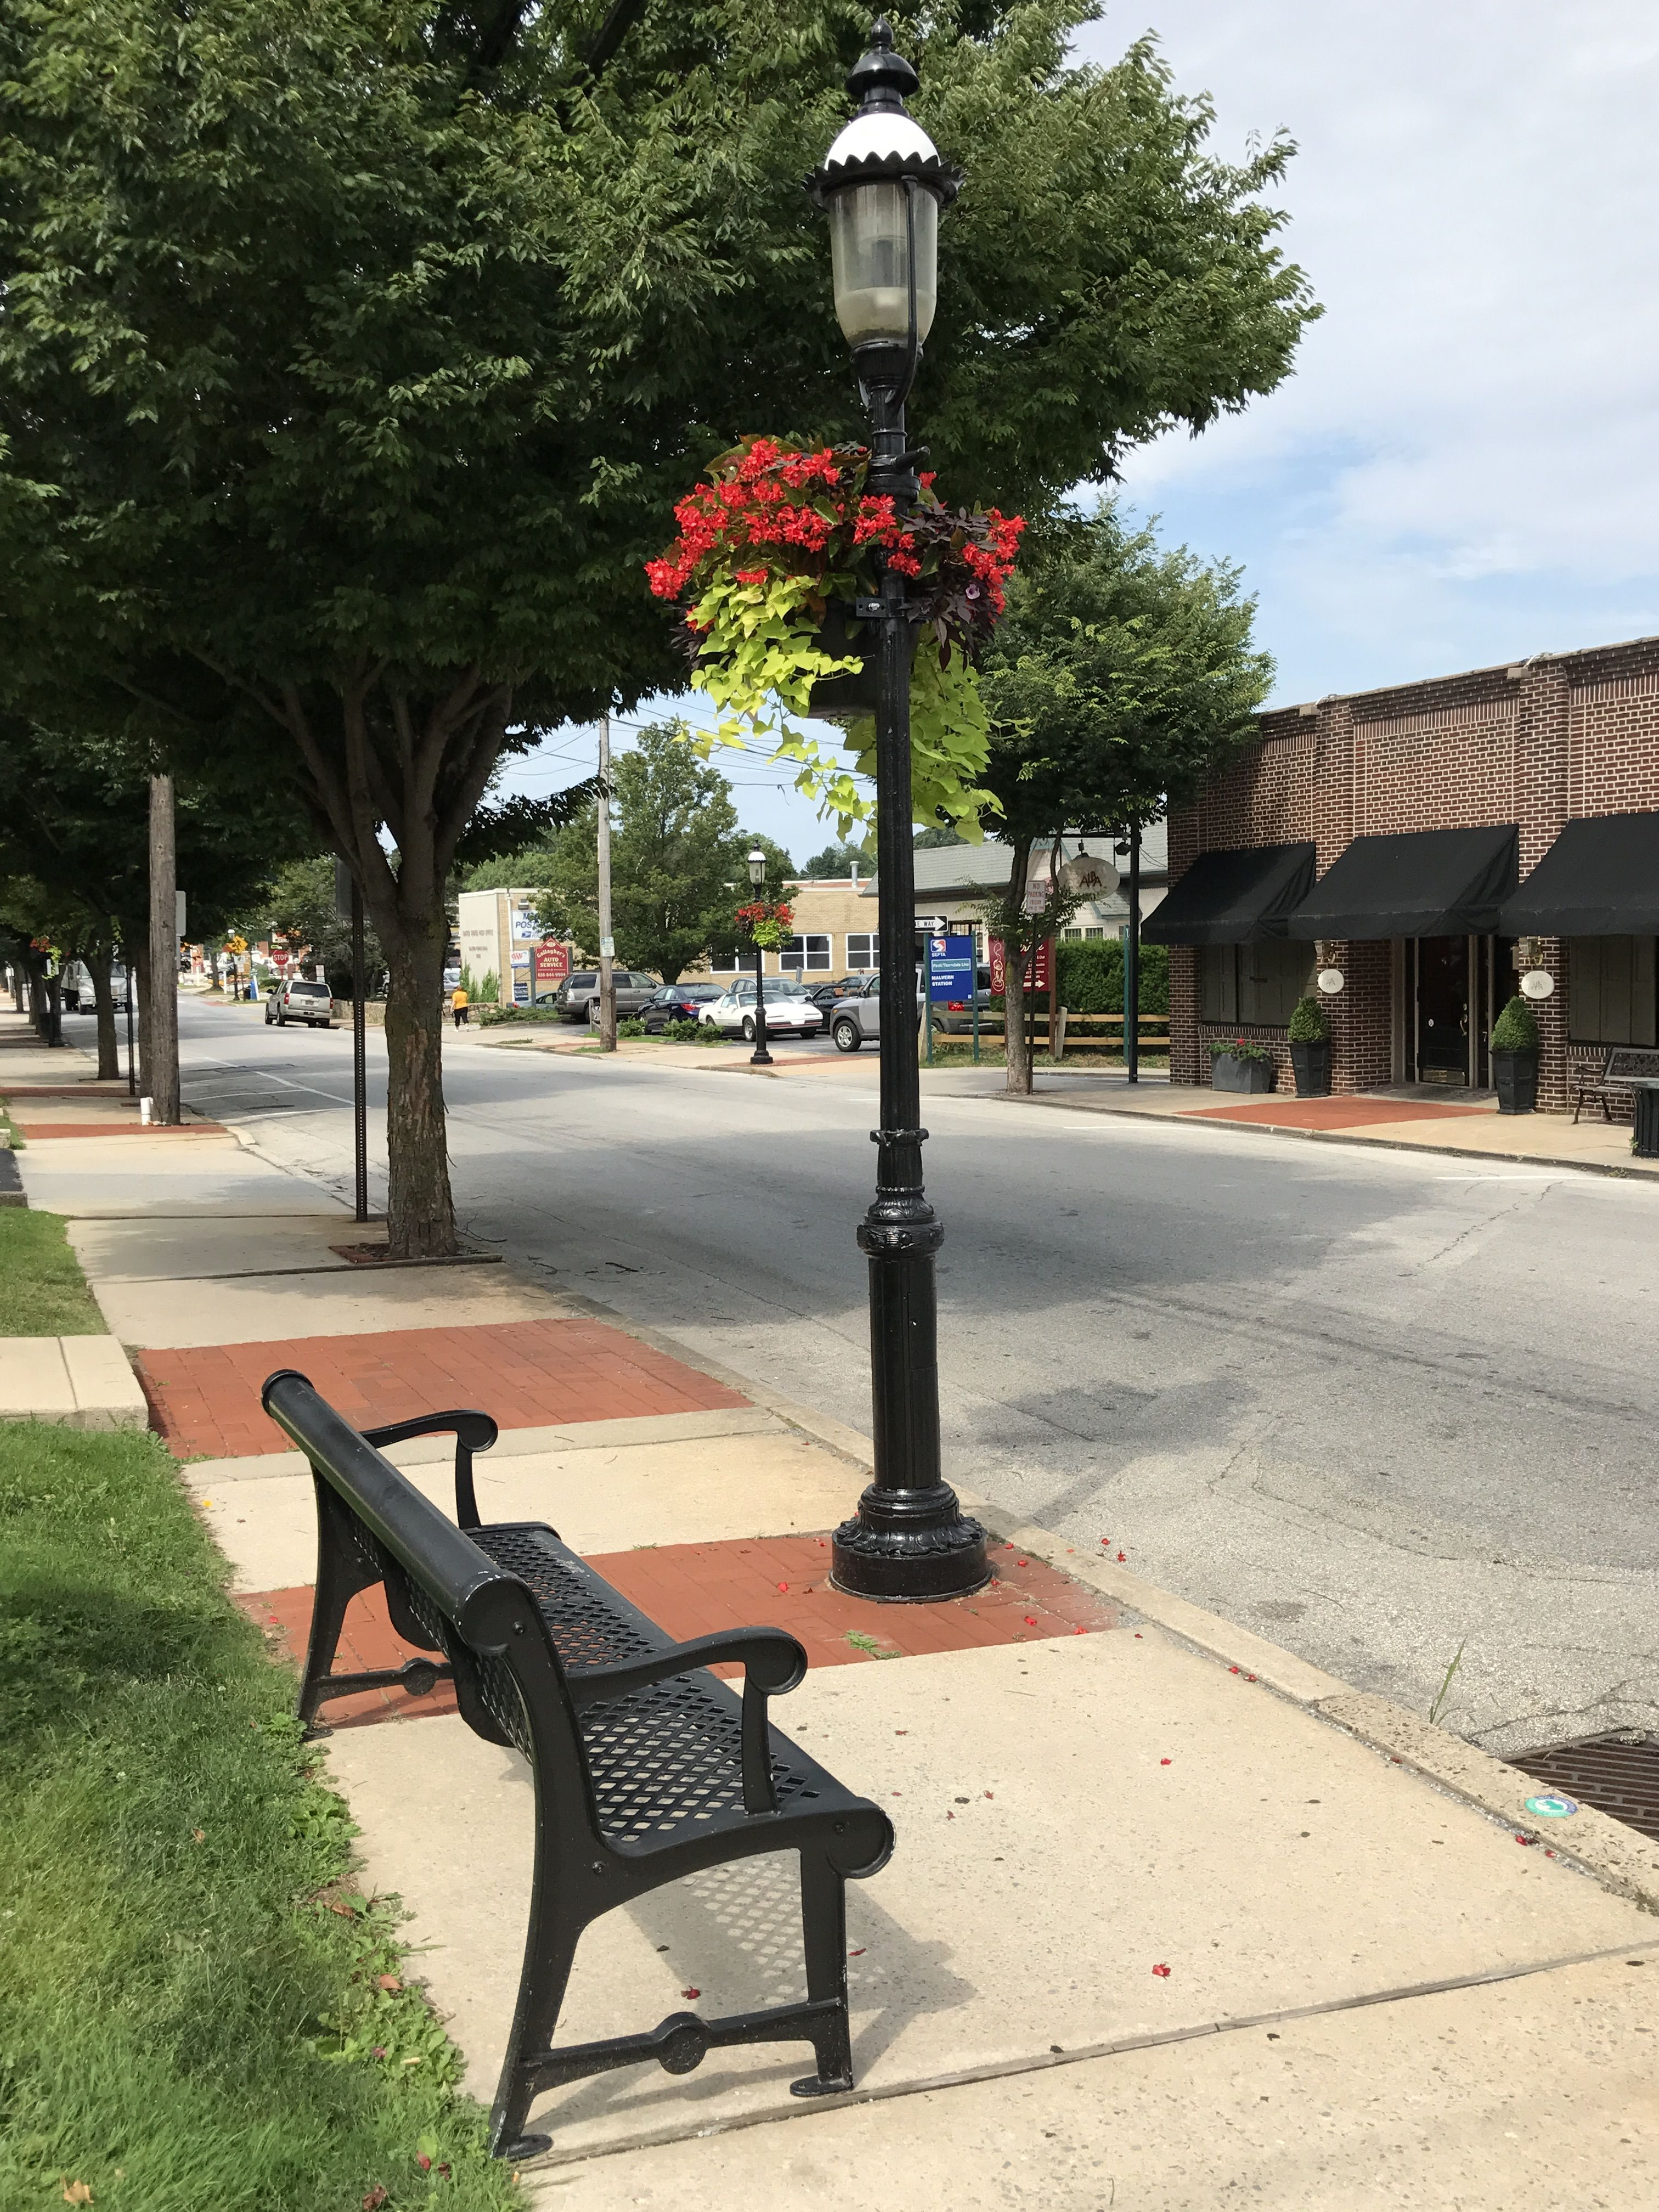 VISCO W series cast iron pole, installed 35 years ago in Malvern Pennsylvania.   Still looking great!